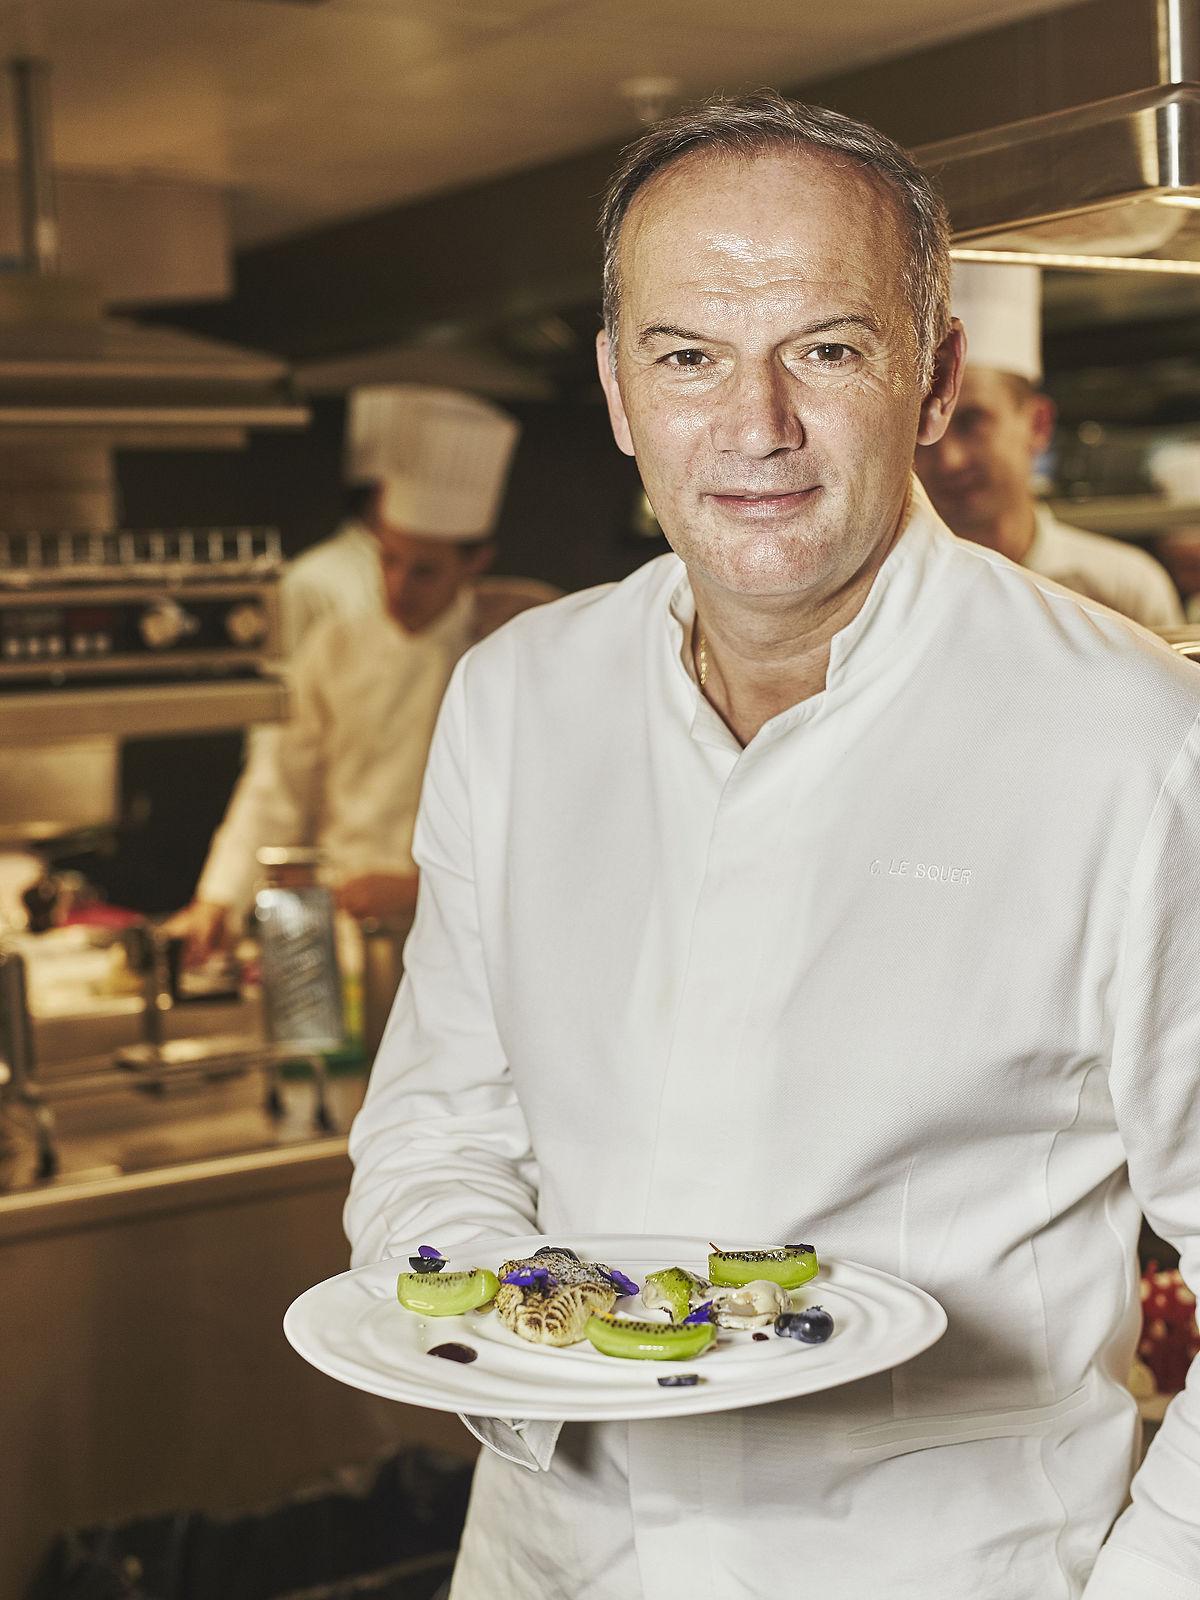 Christian le squer wikip dia for Formation cuisine gastronomique